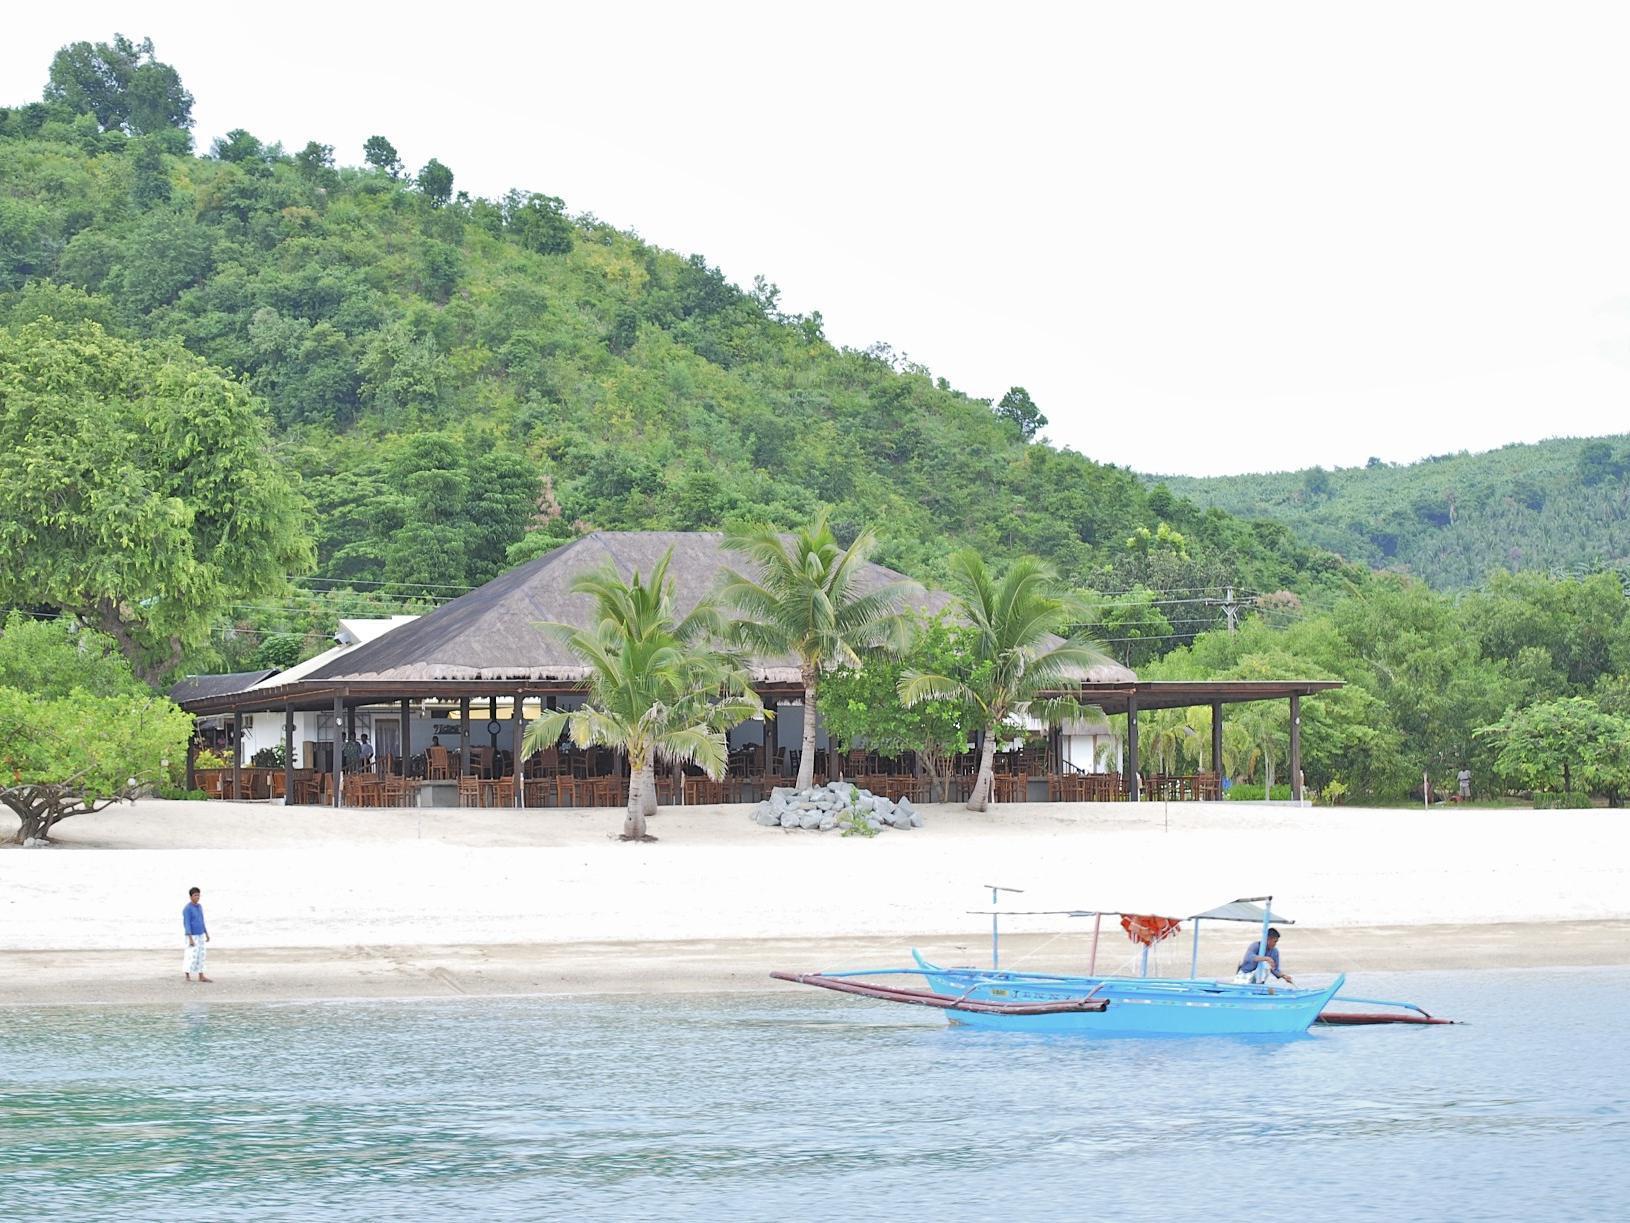 Virgin Beach Resort San Juan Batangas Philippines Great Discounted Rates